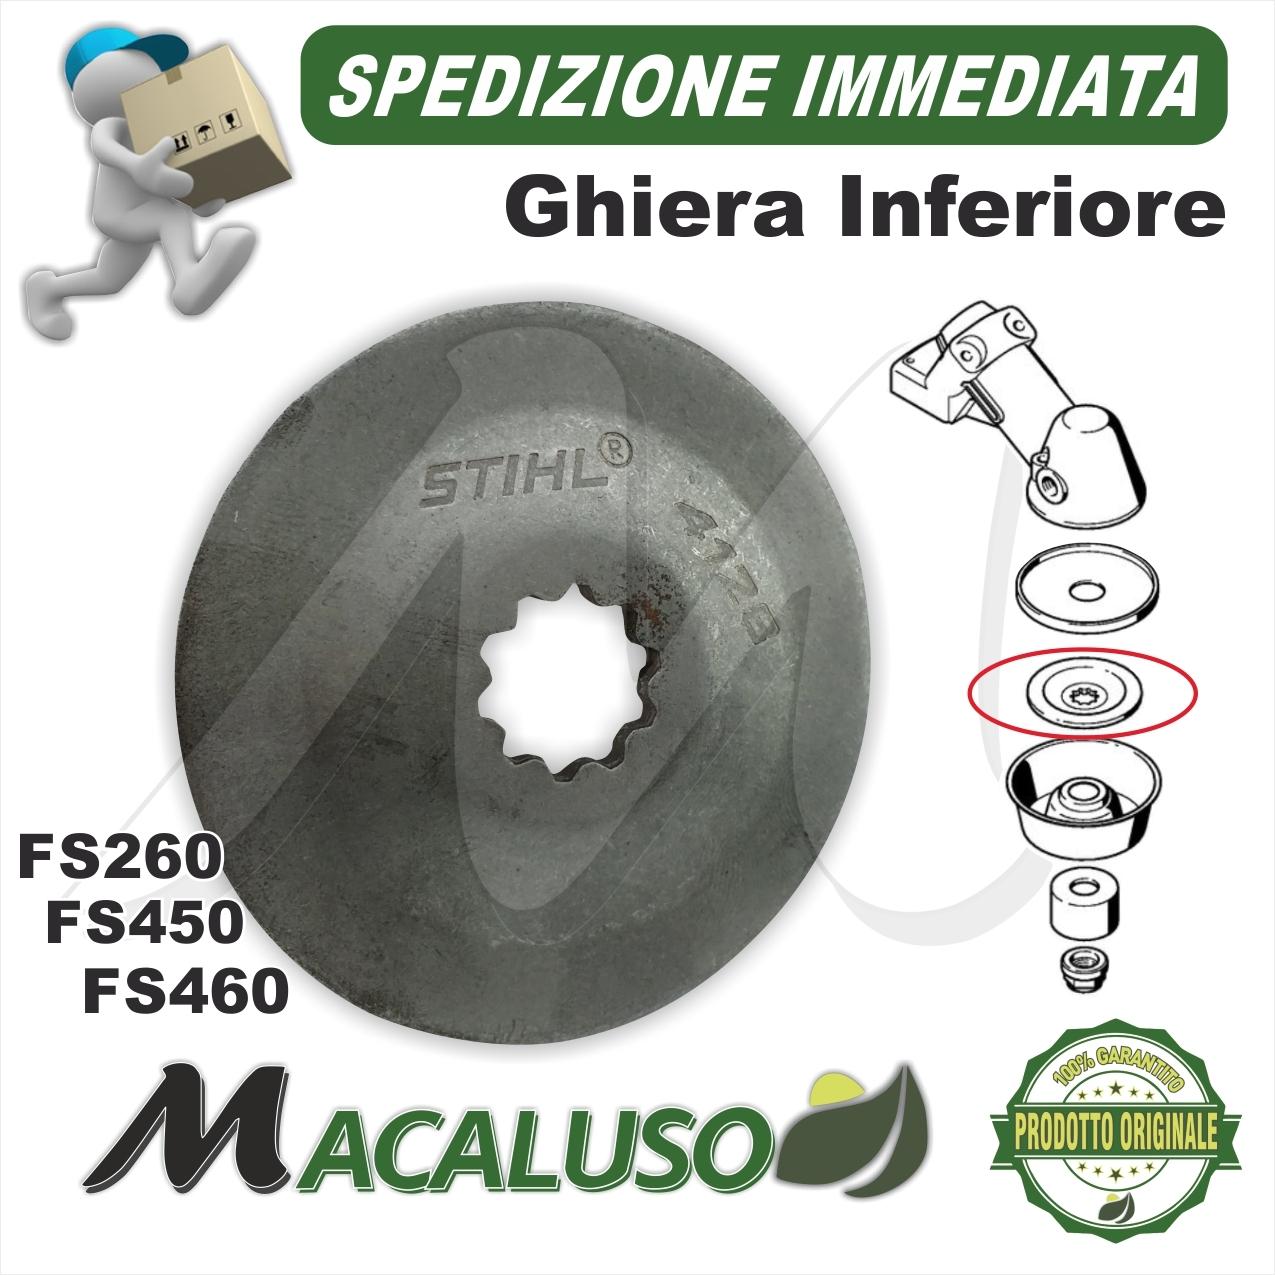 International ISE/® ISE/® FS450 sostituisce i Numeri di Parte: 4128 080 2101 Copertura di Ricambio per Stihl FS400 FS480